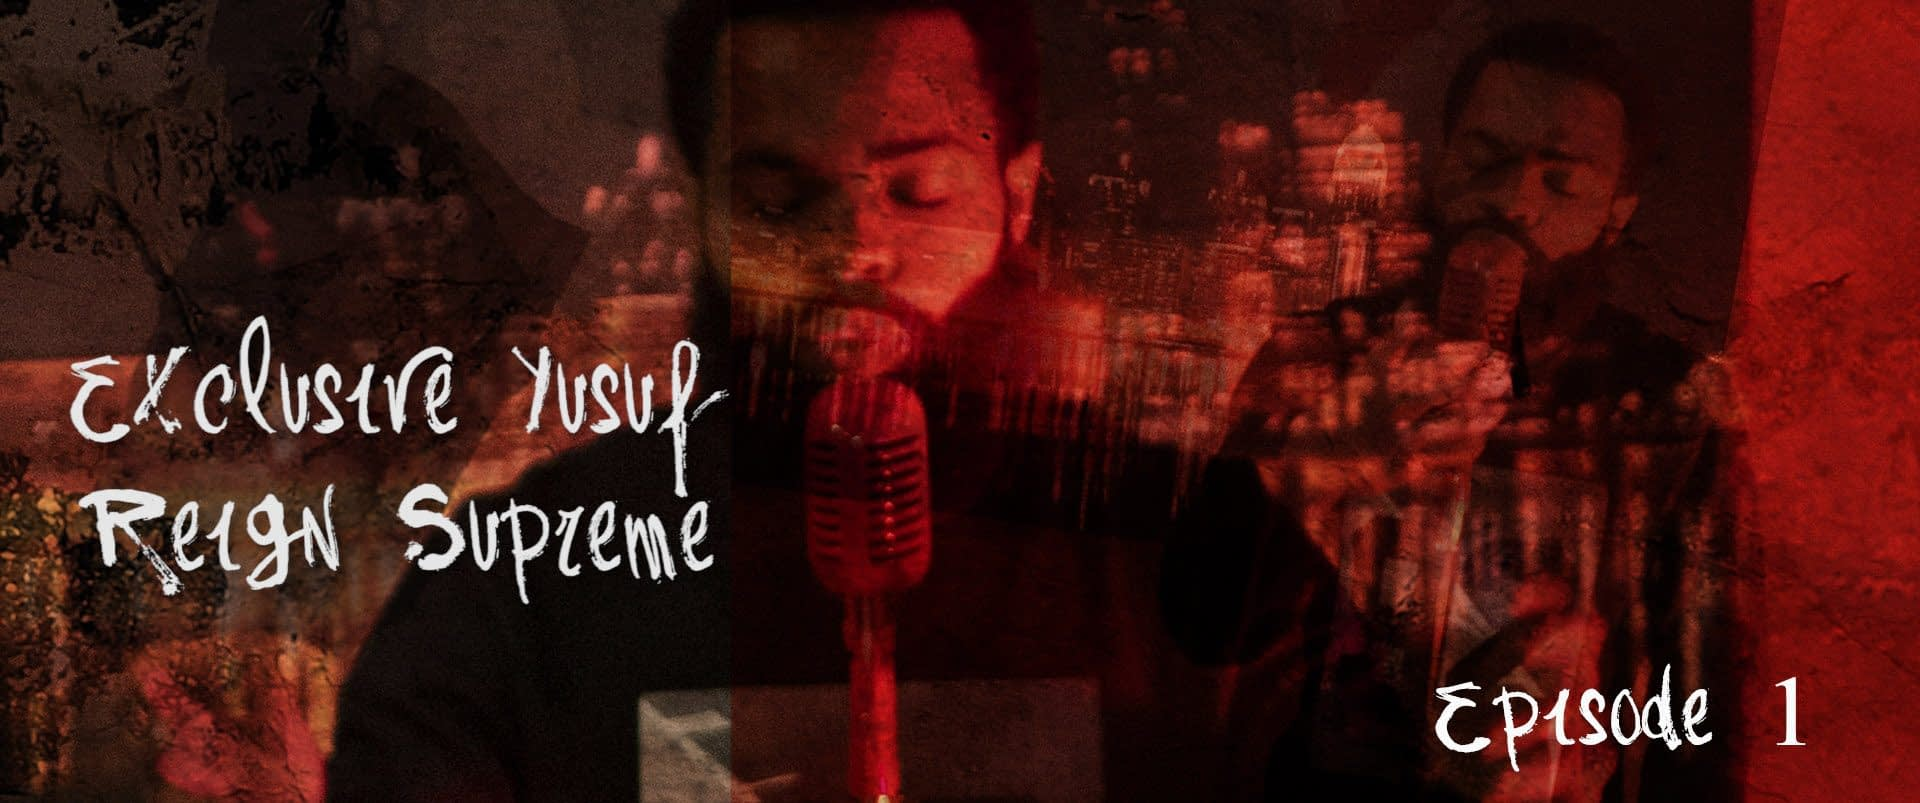 Exclusive Yusuf EP 1